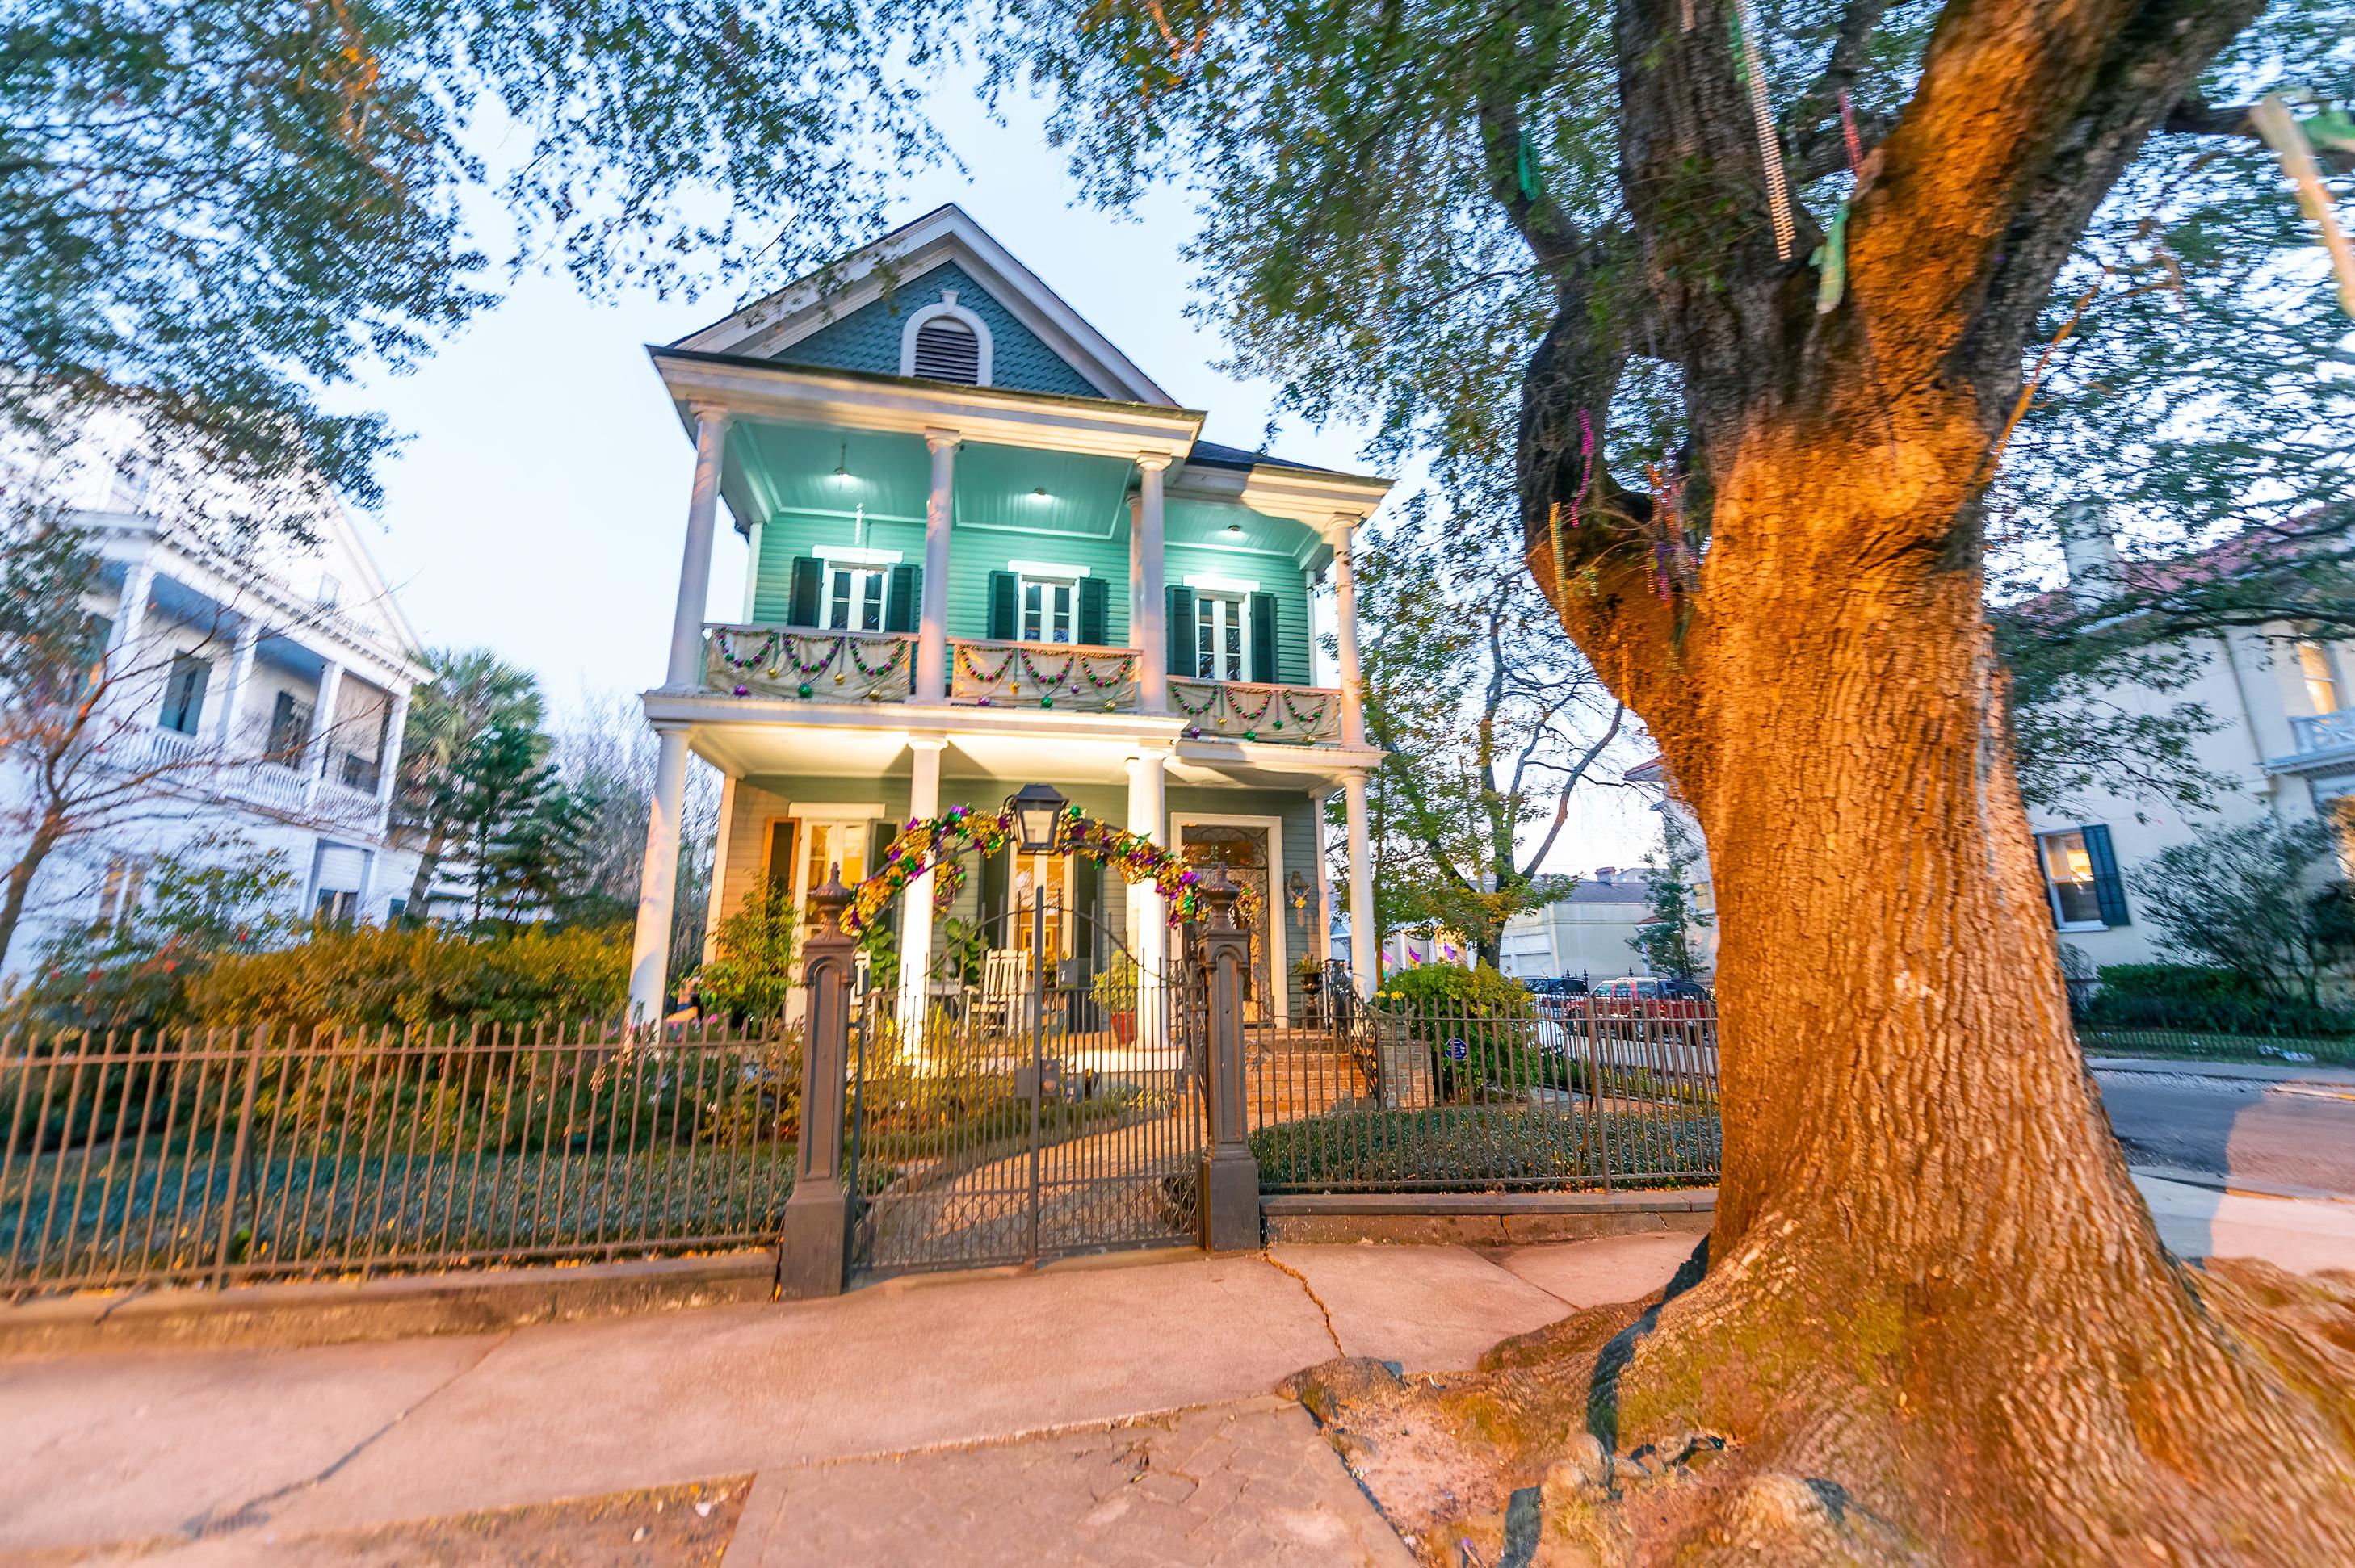 Historical southern style homes along Sa